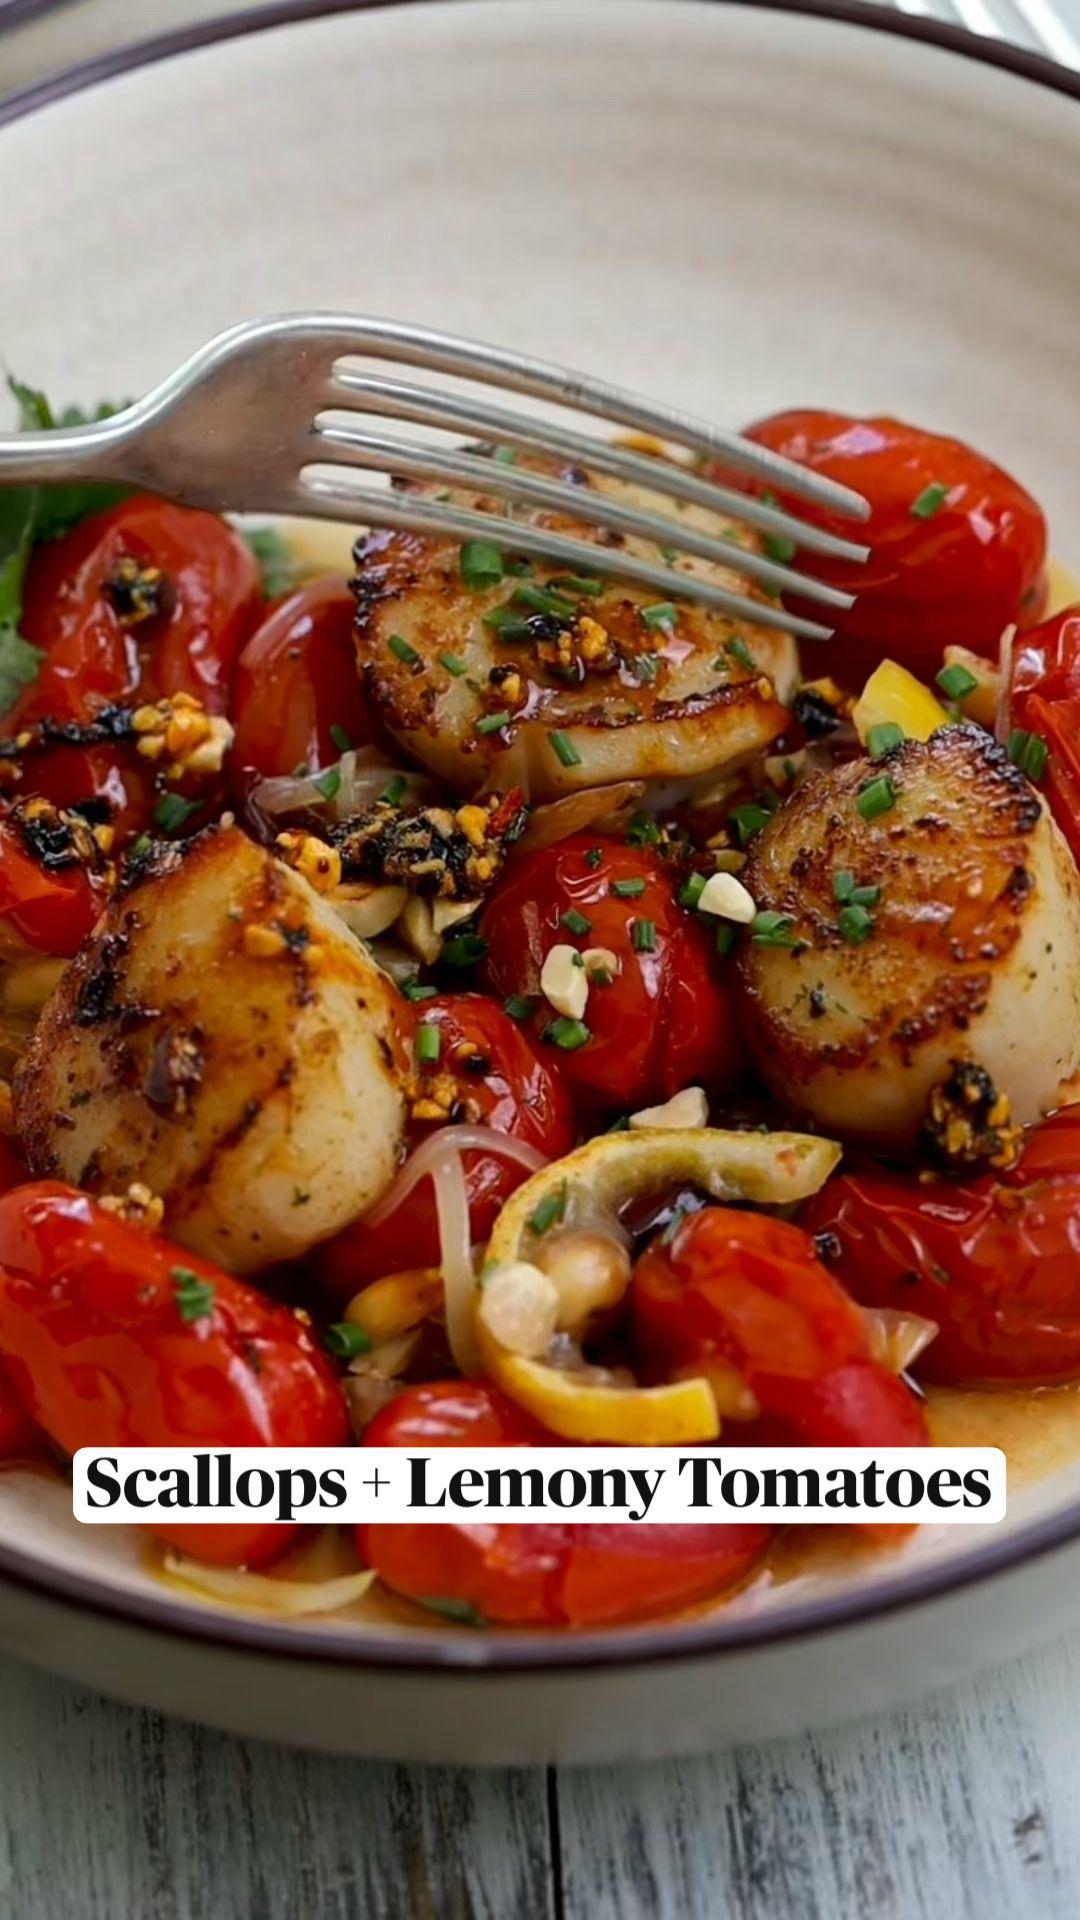 Scallops + Lemony Tomatoes